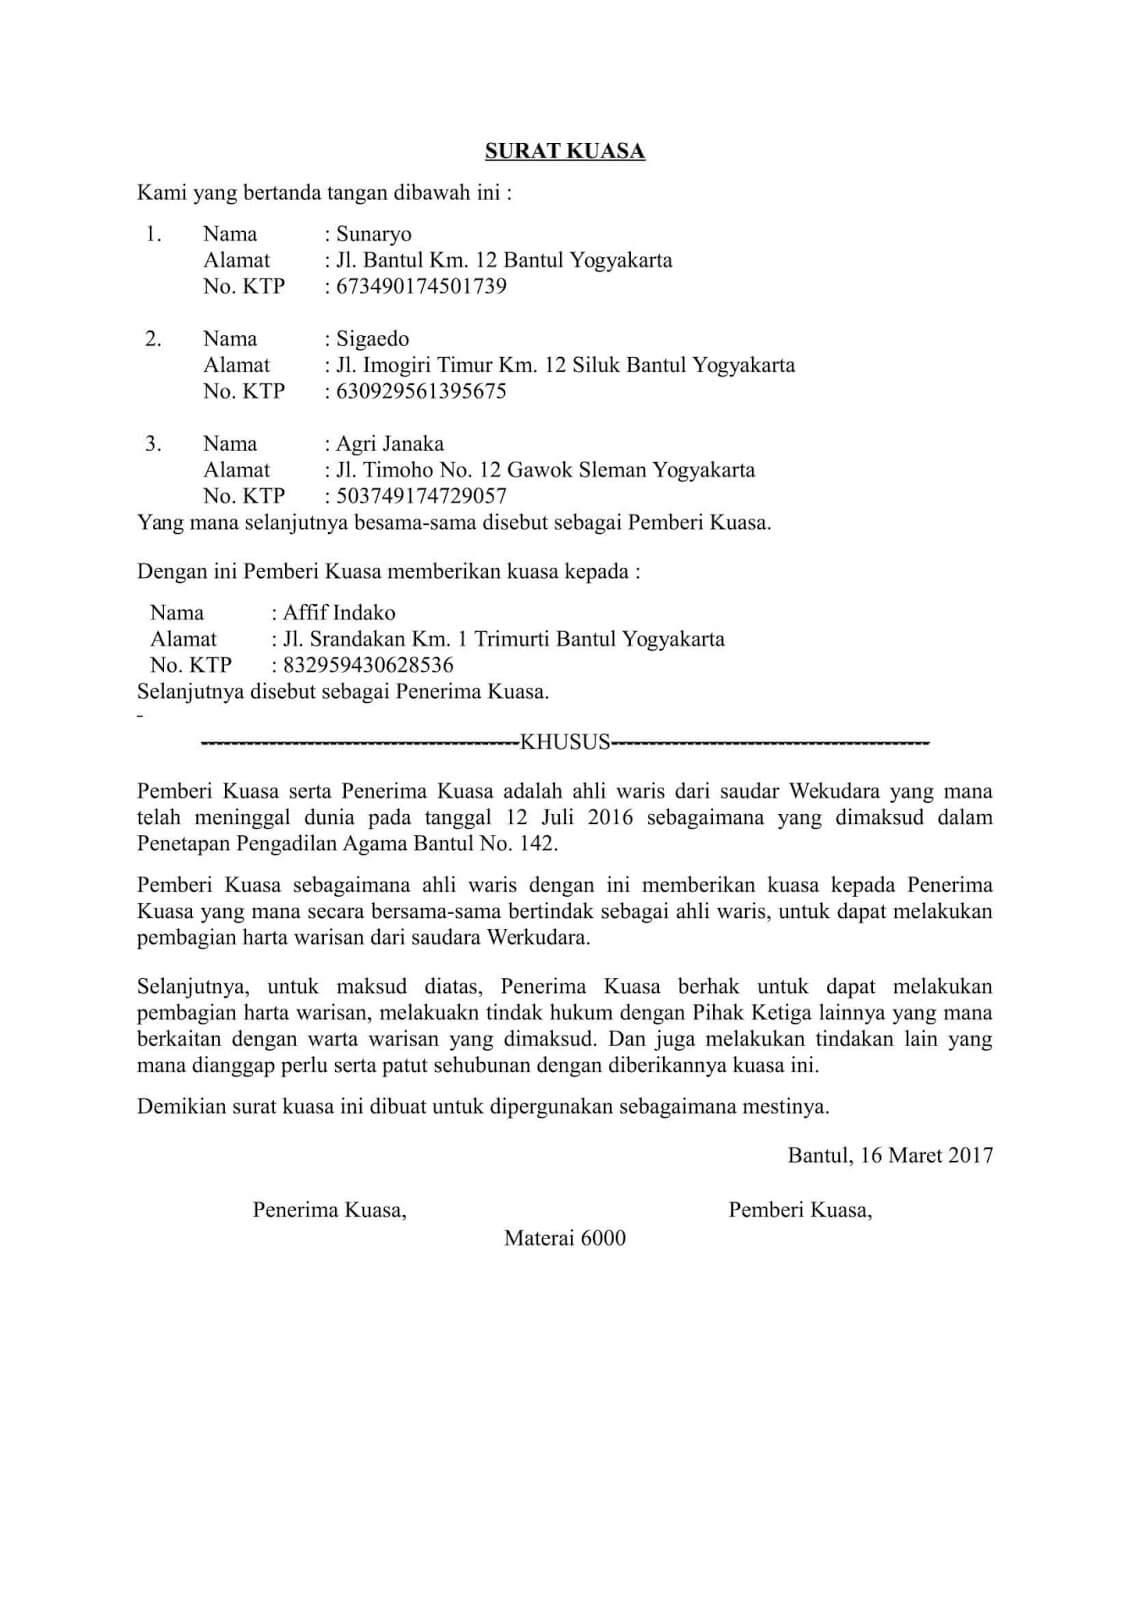 15 Contoh Surat Keterangan Ahli Waris Akta Waris Lengkap